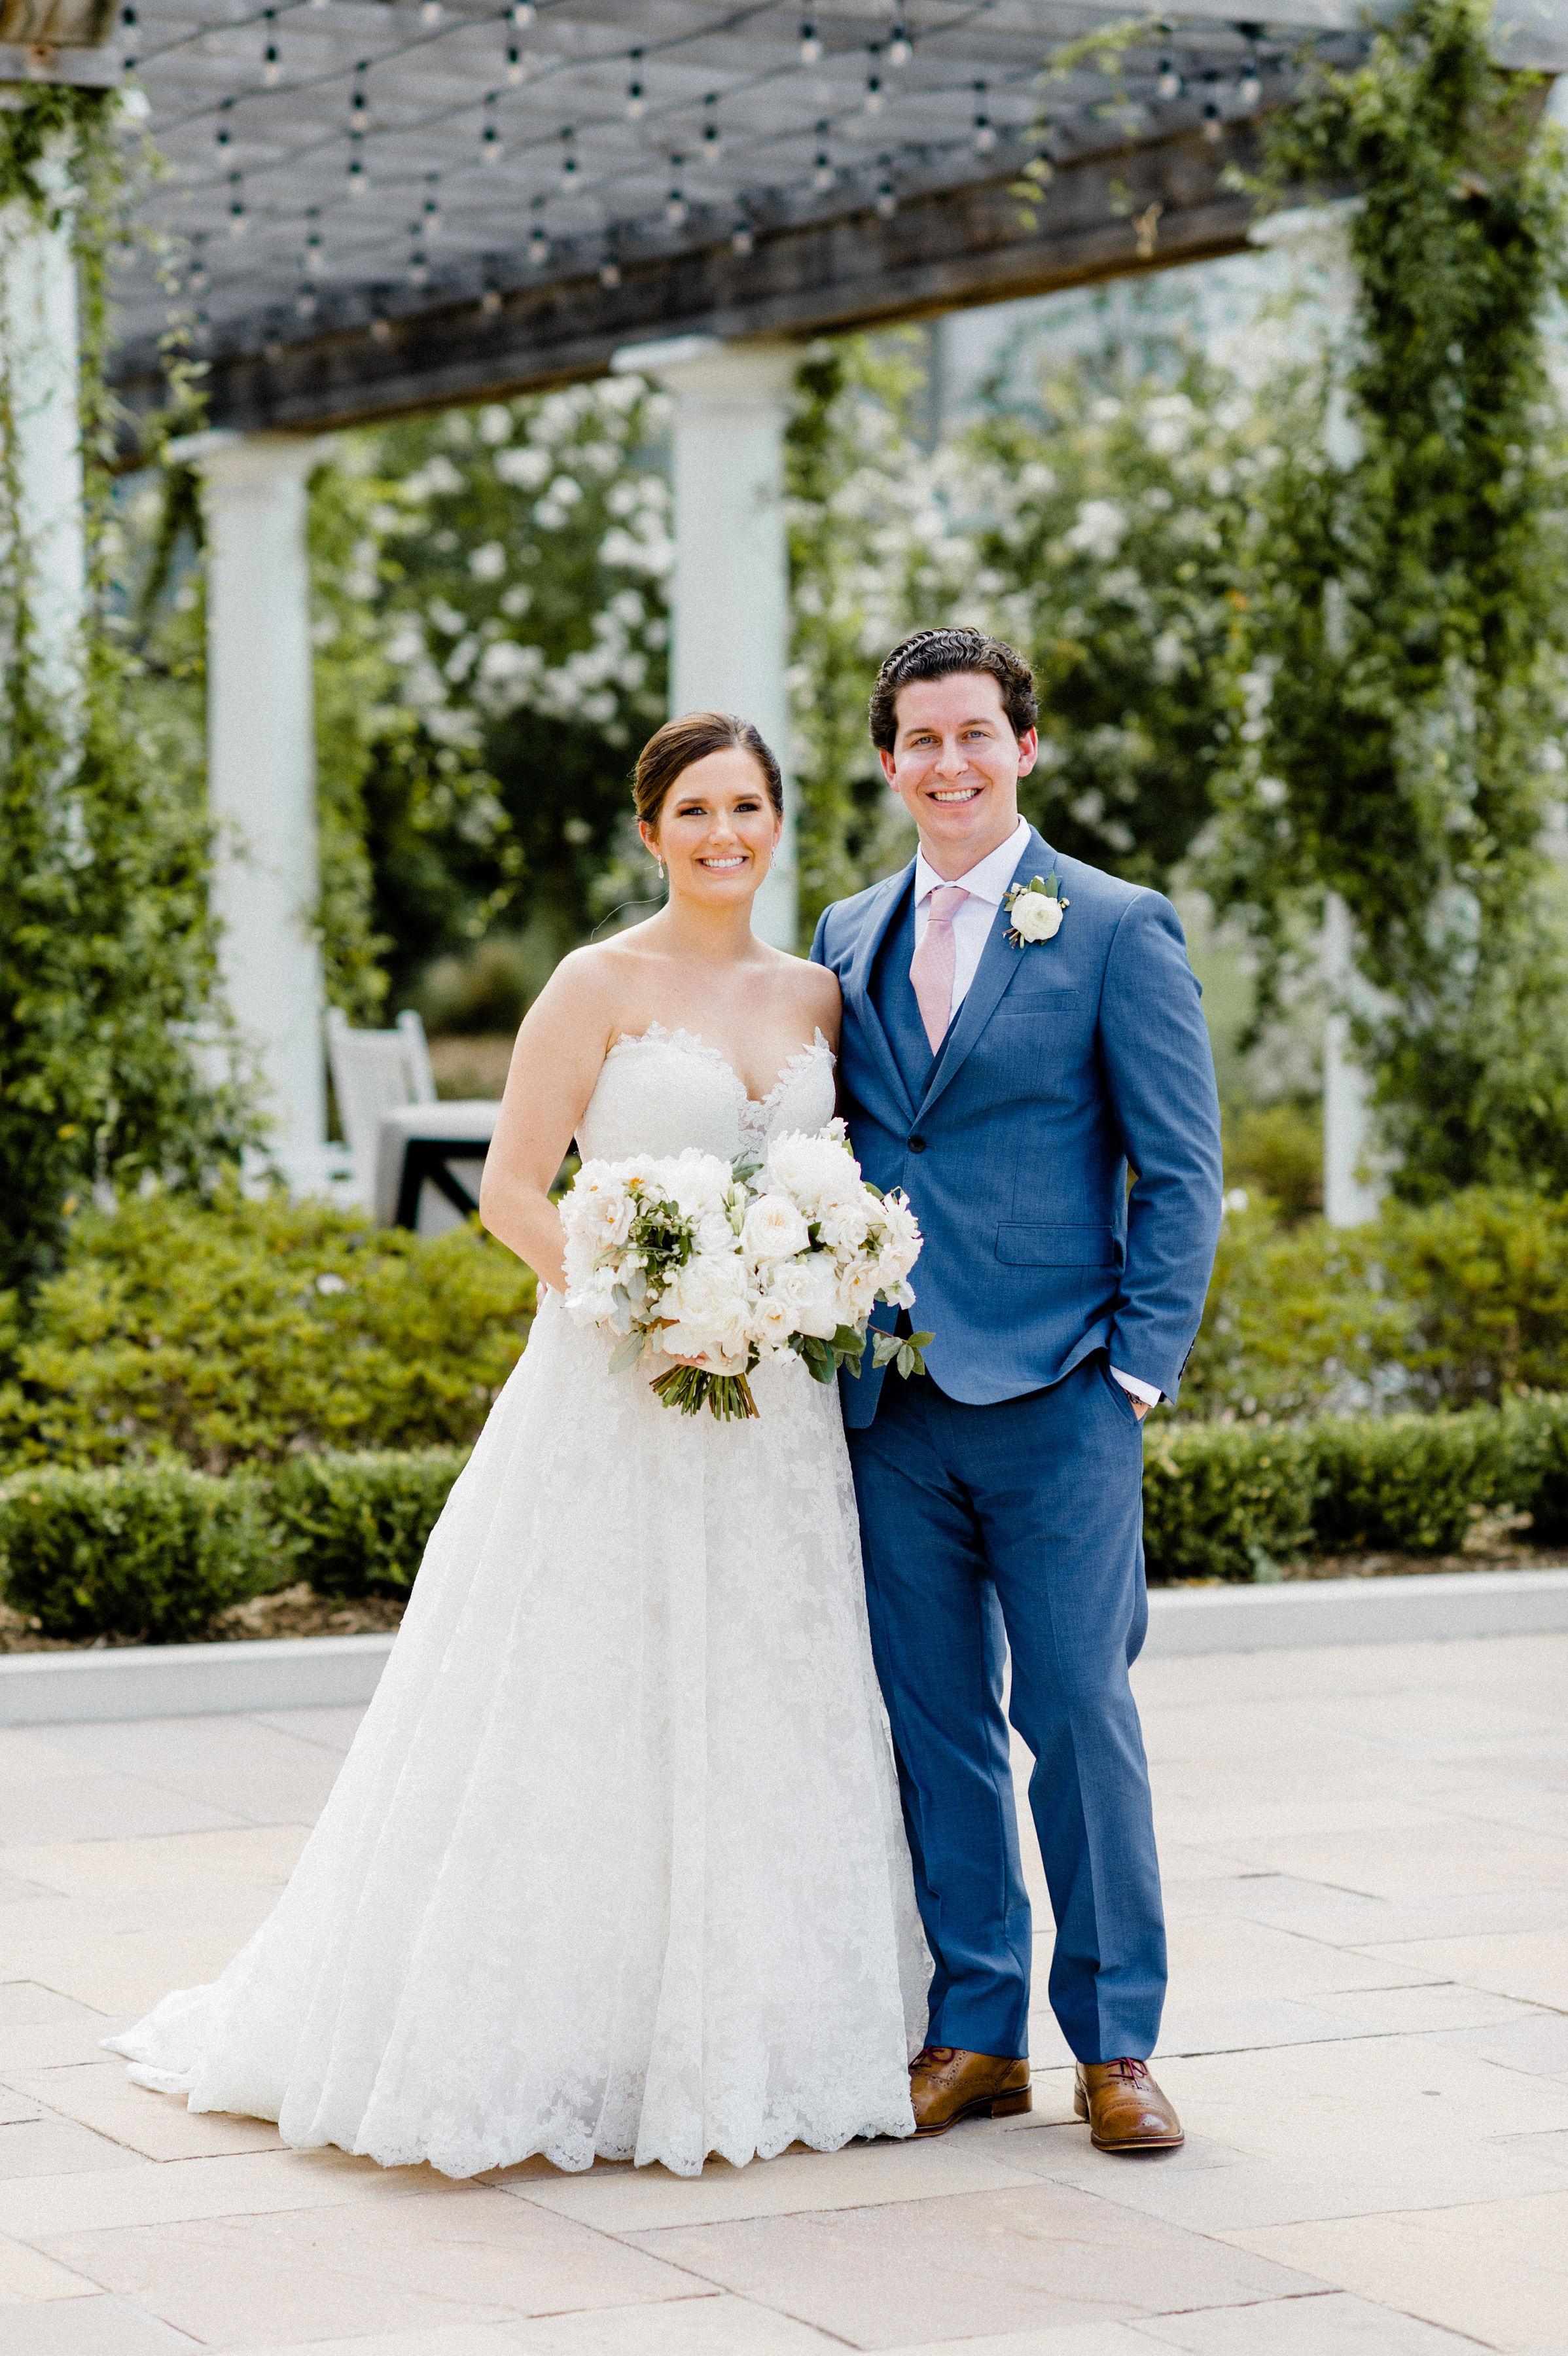 McElravey_Wedding_CarolineLimaPhotography_2018_195.jpg